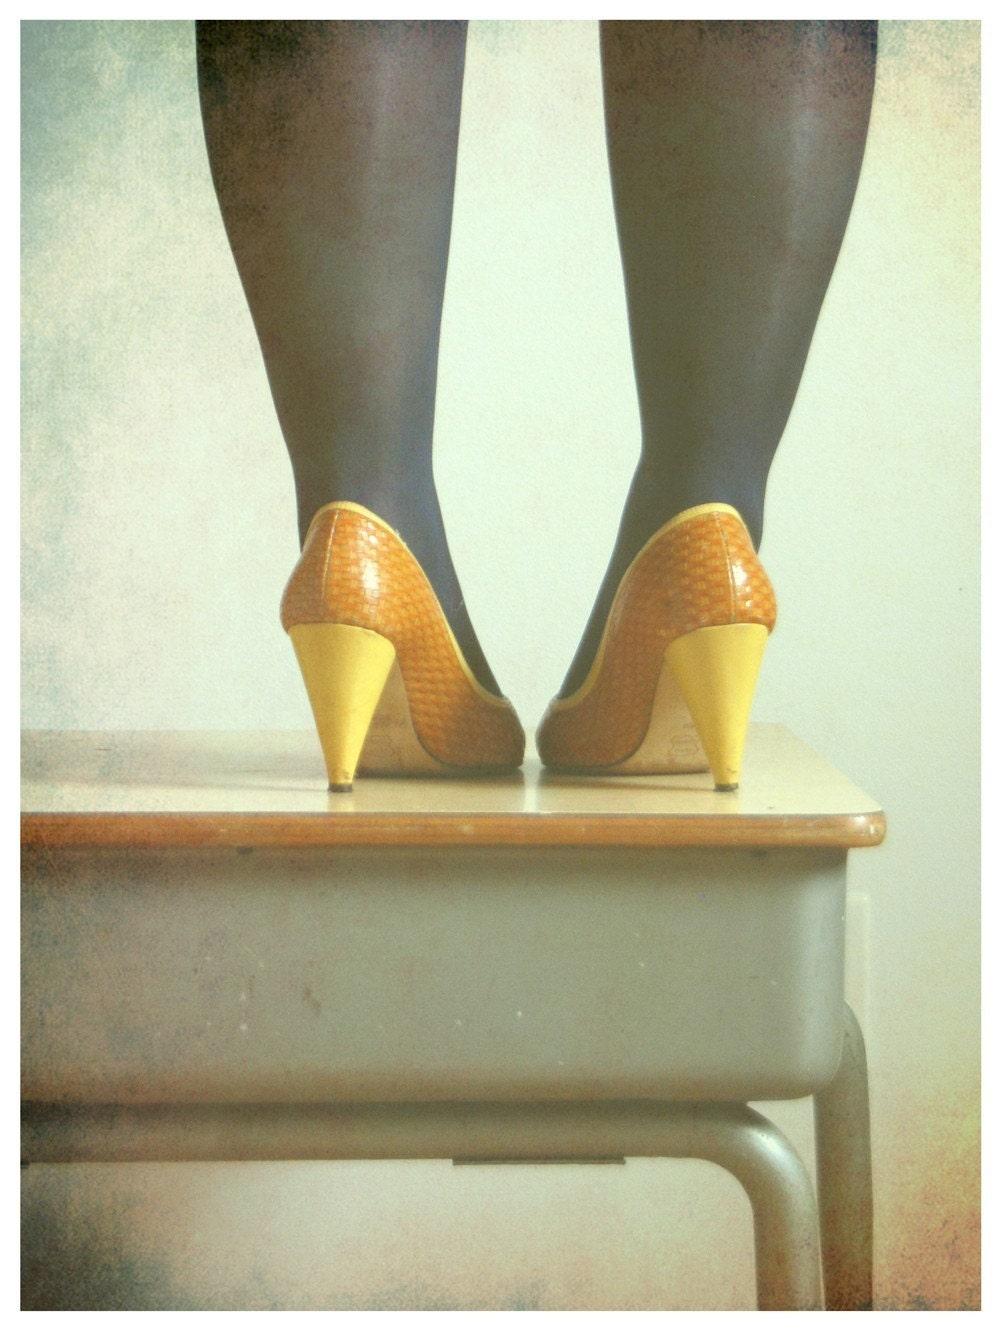 My Pretty Power 5x7 Fine Art Print--Vintage Shoes Elementary School Desk Retro Photograph